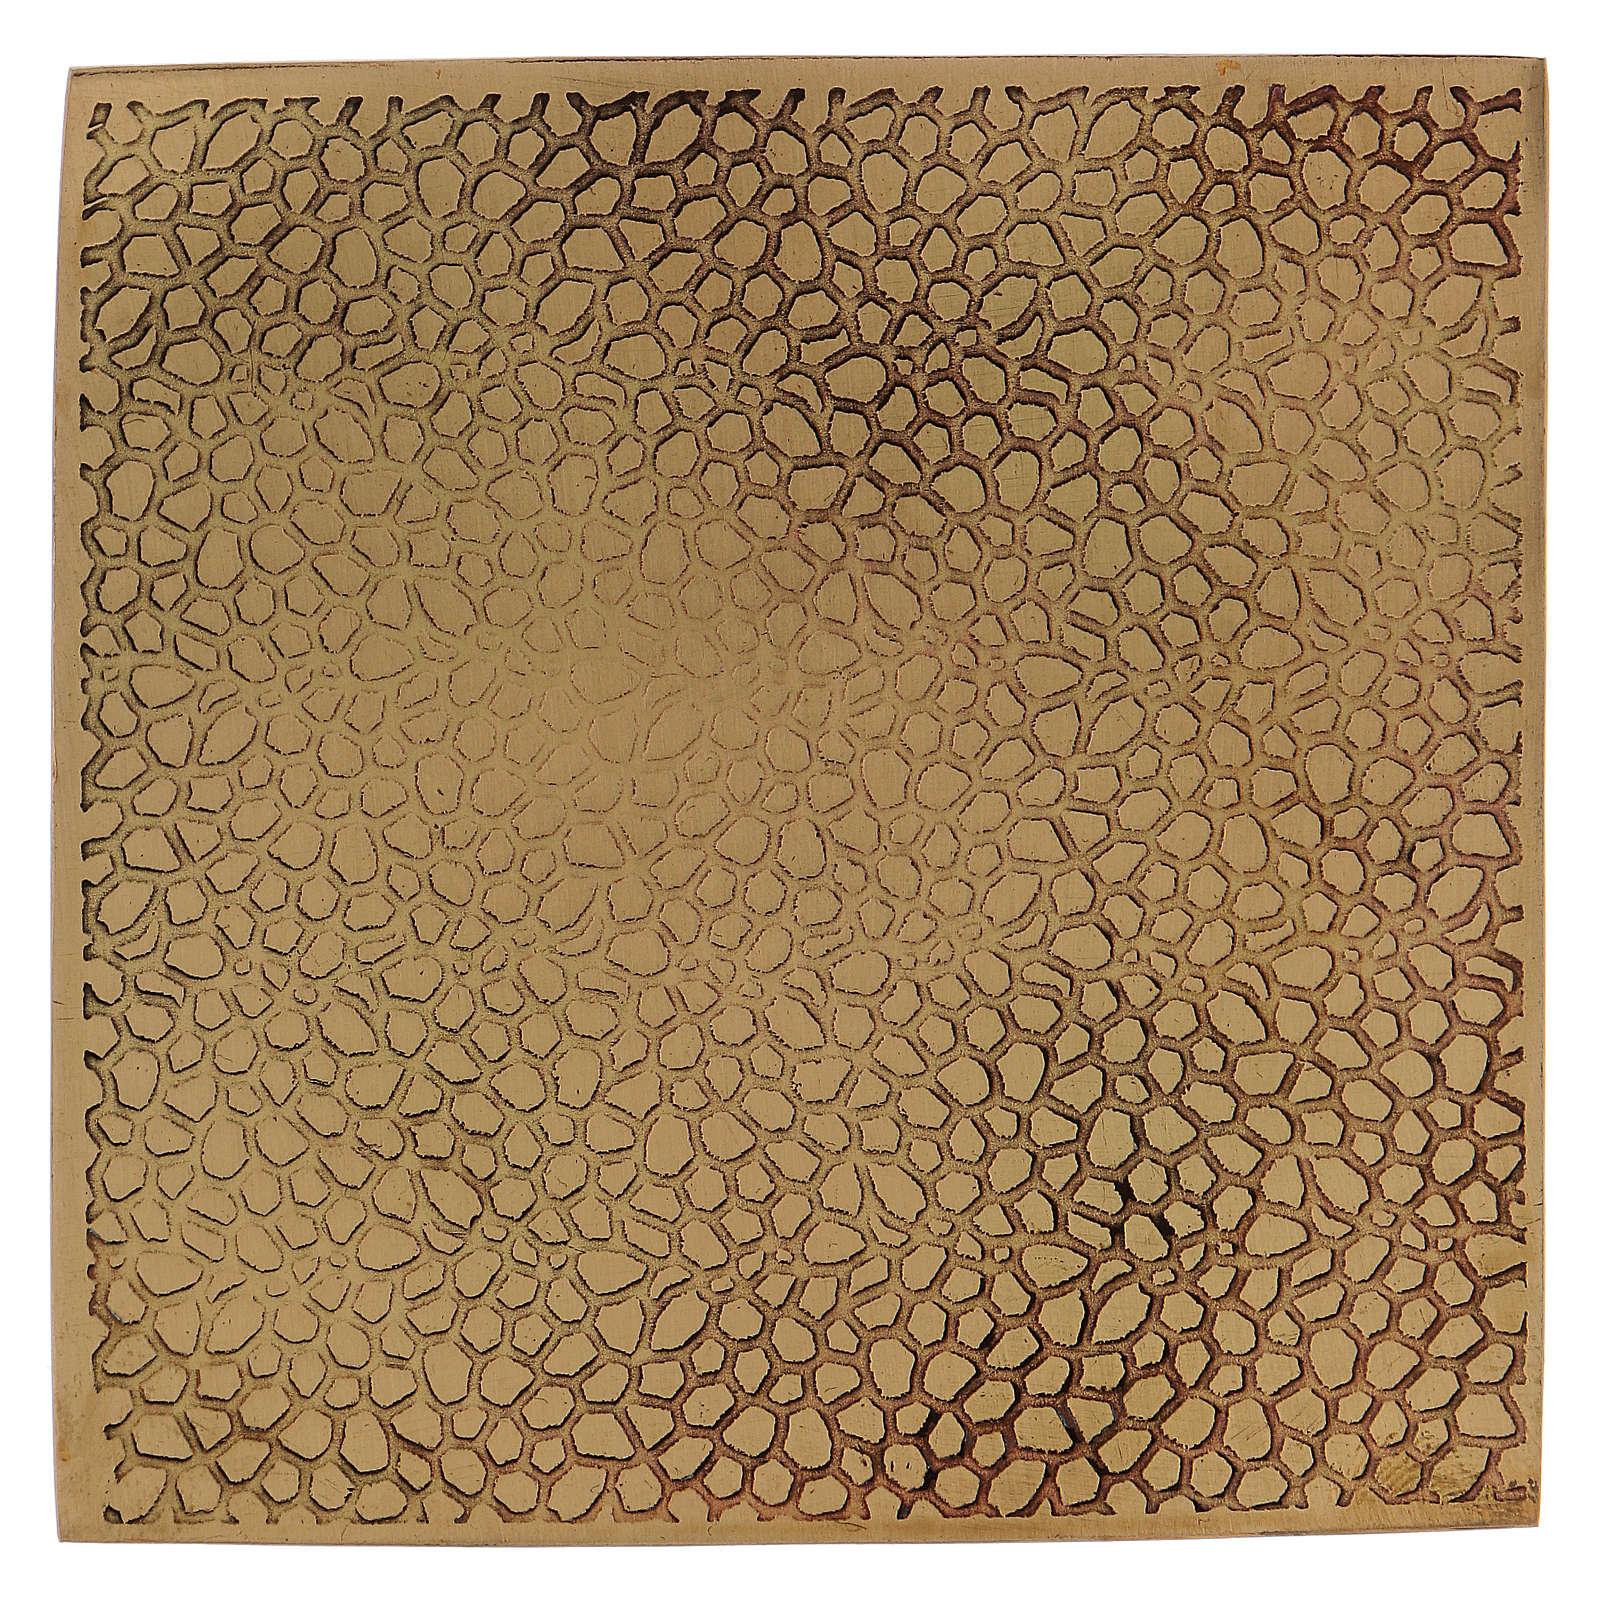 Piattino portacandela quadrato ottone dorato opaco 10x10 cm 3